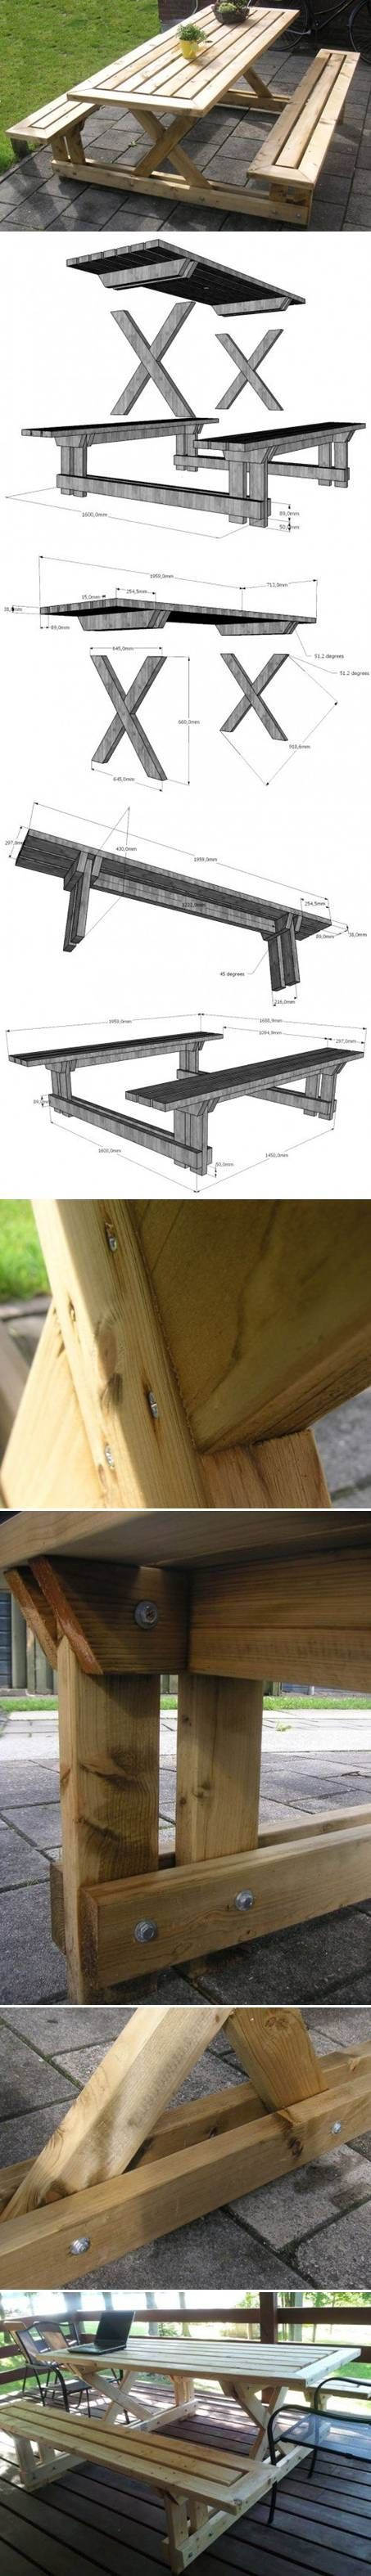 Diy garden bench and table deck chairs pinterest diy garden